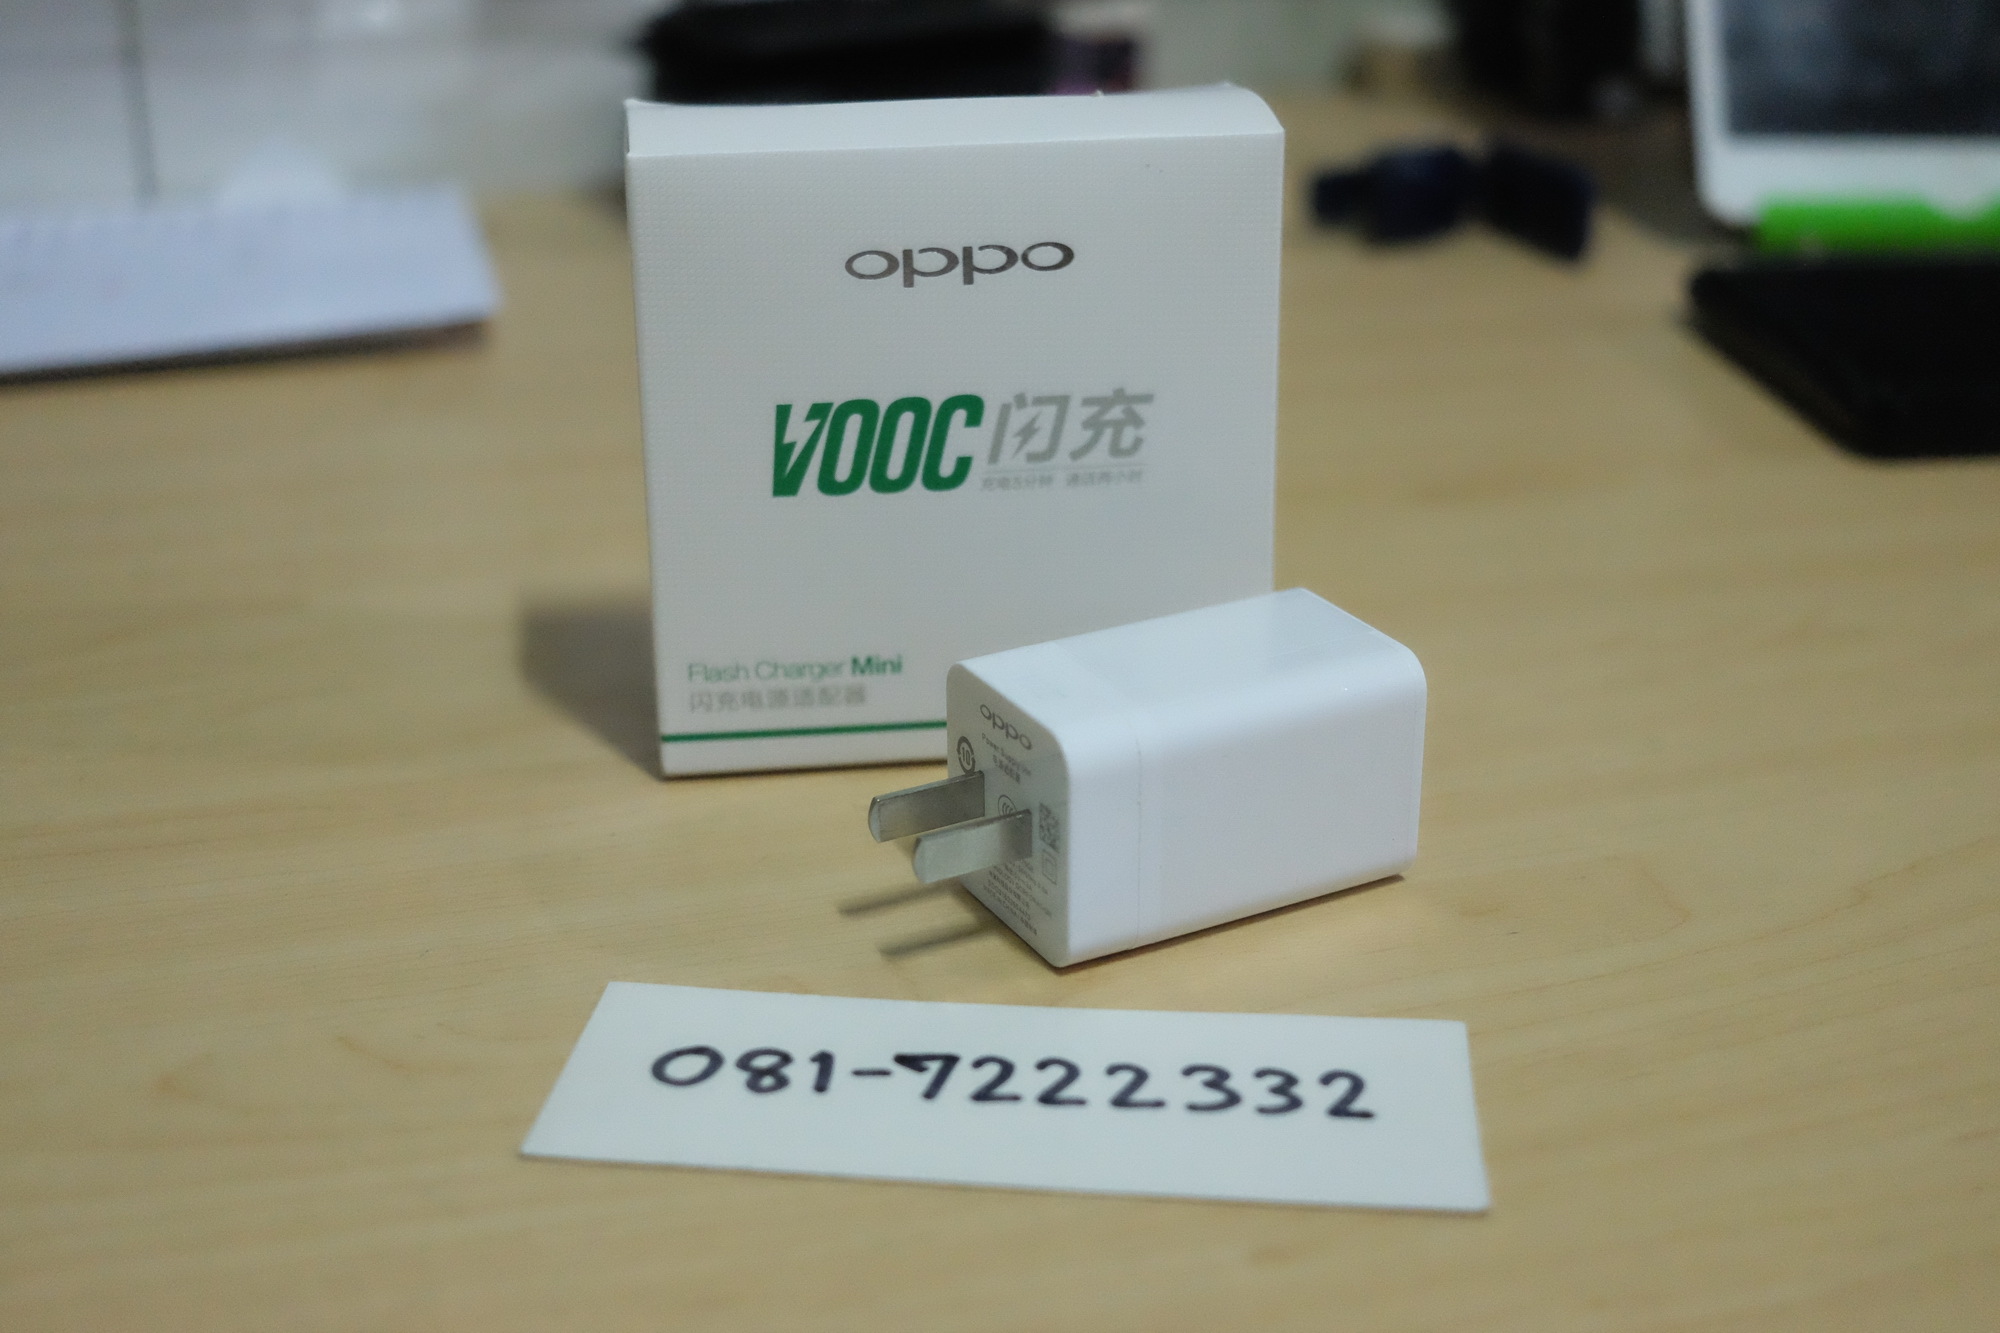 OPPO หัวชาร์จแบบชาร์จเร็ว VOOC Flash Charger Mini ใช้เวลาน้อยกว่า แต่ชาร์จได้มากกว่า